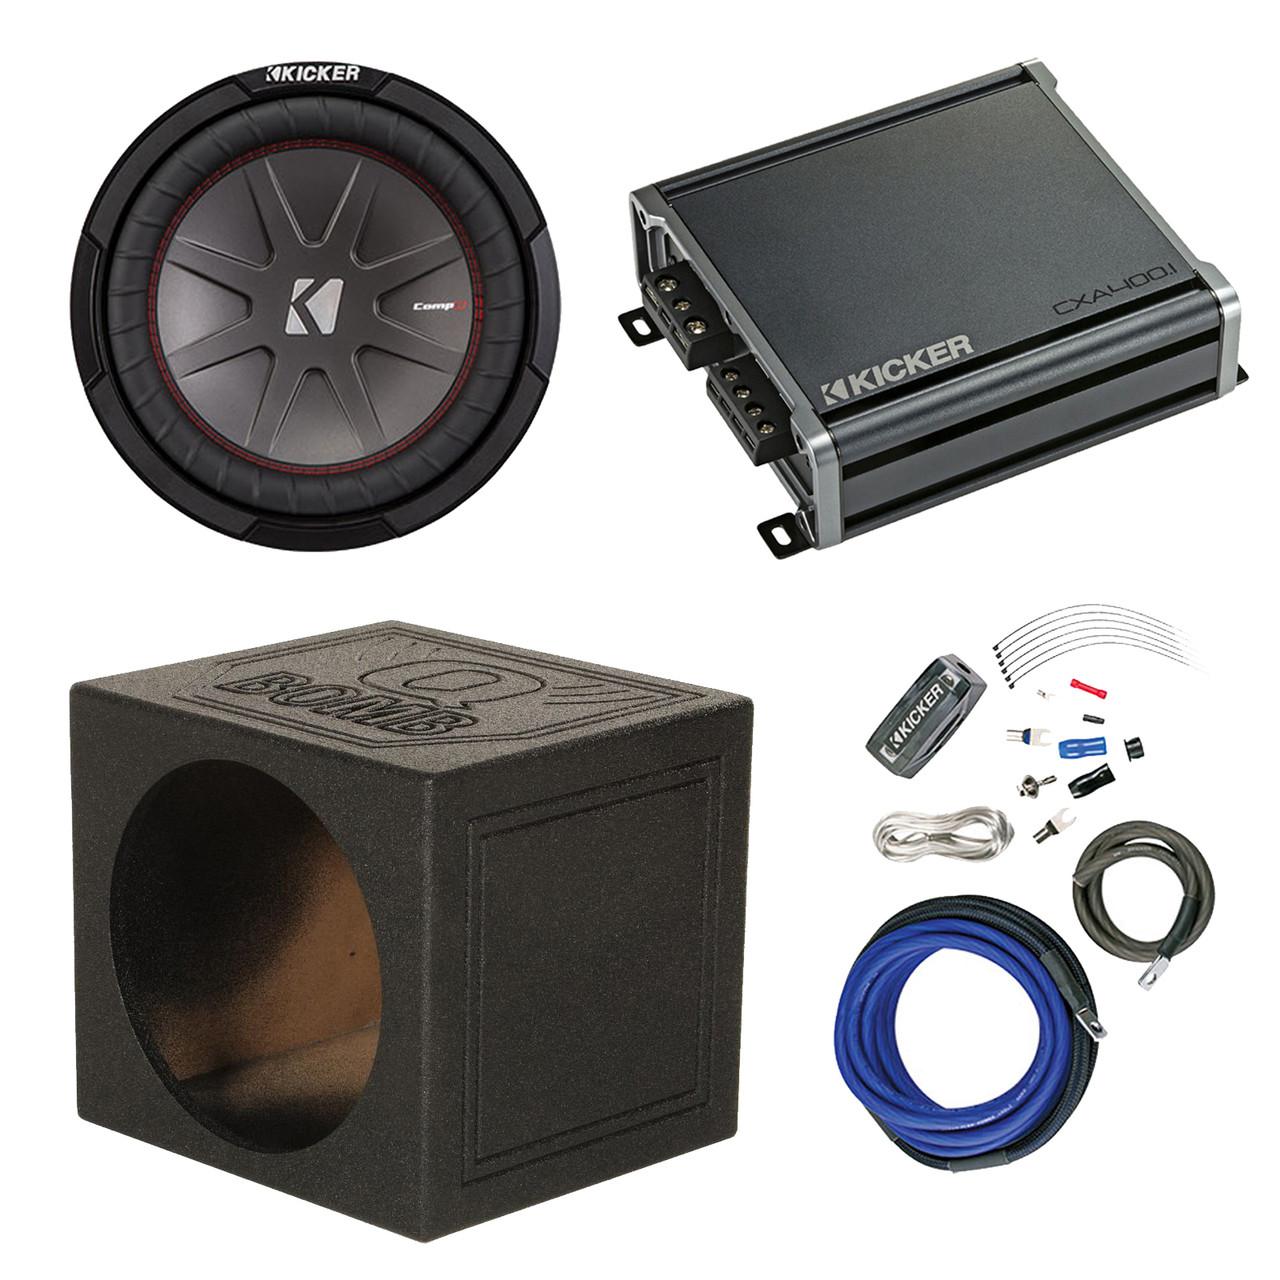 small resolution of kicker 10 4 ohm car audio subwoofer 600 watt amp 10 sub box amp wiring kit r 43cwr104 1 43cxa3001 road entertainment